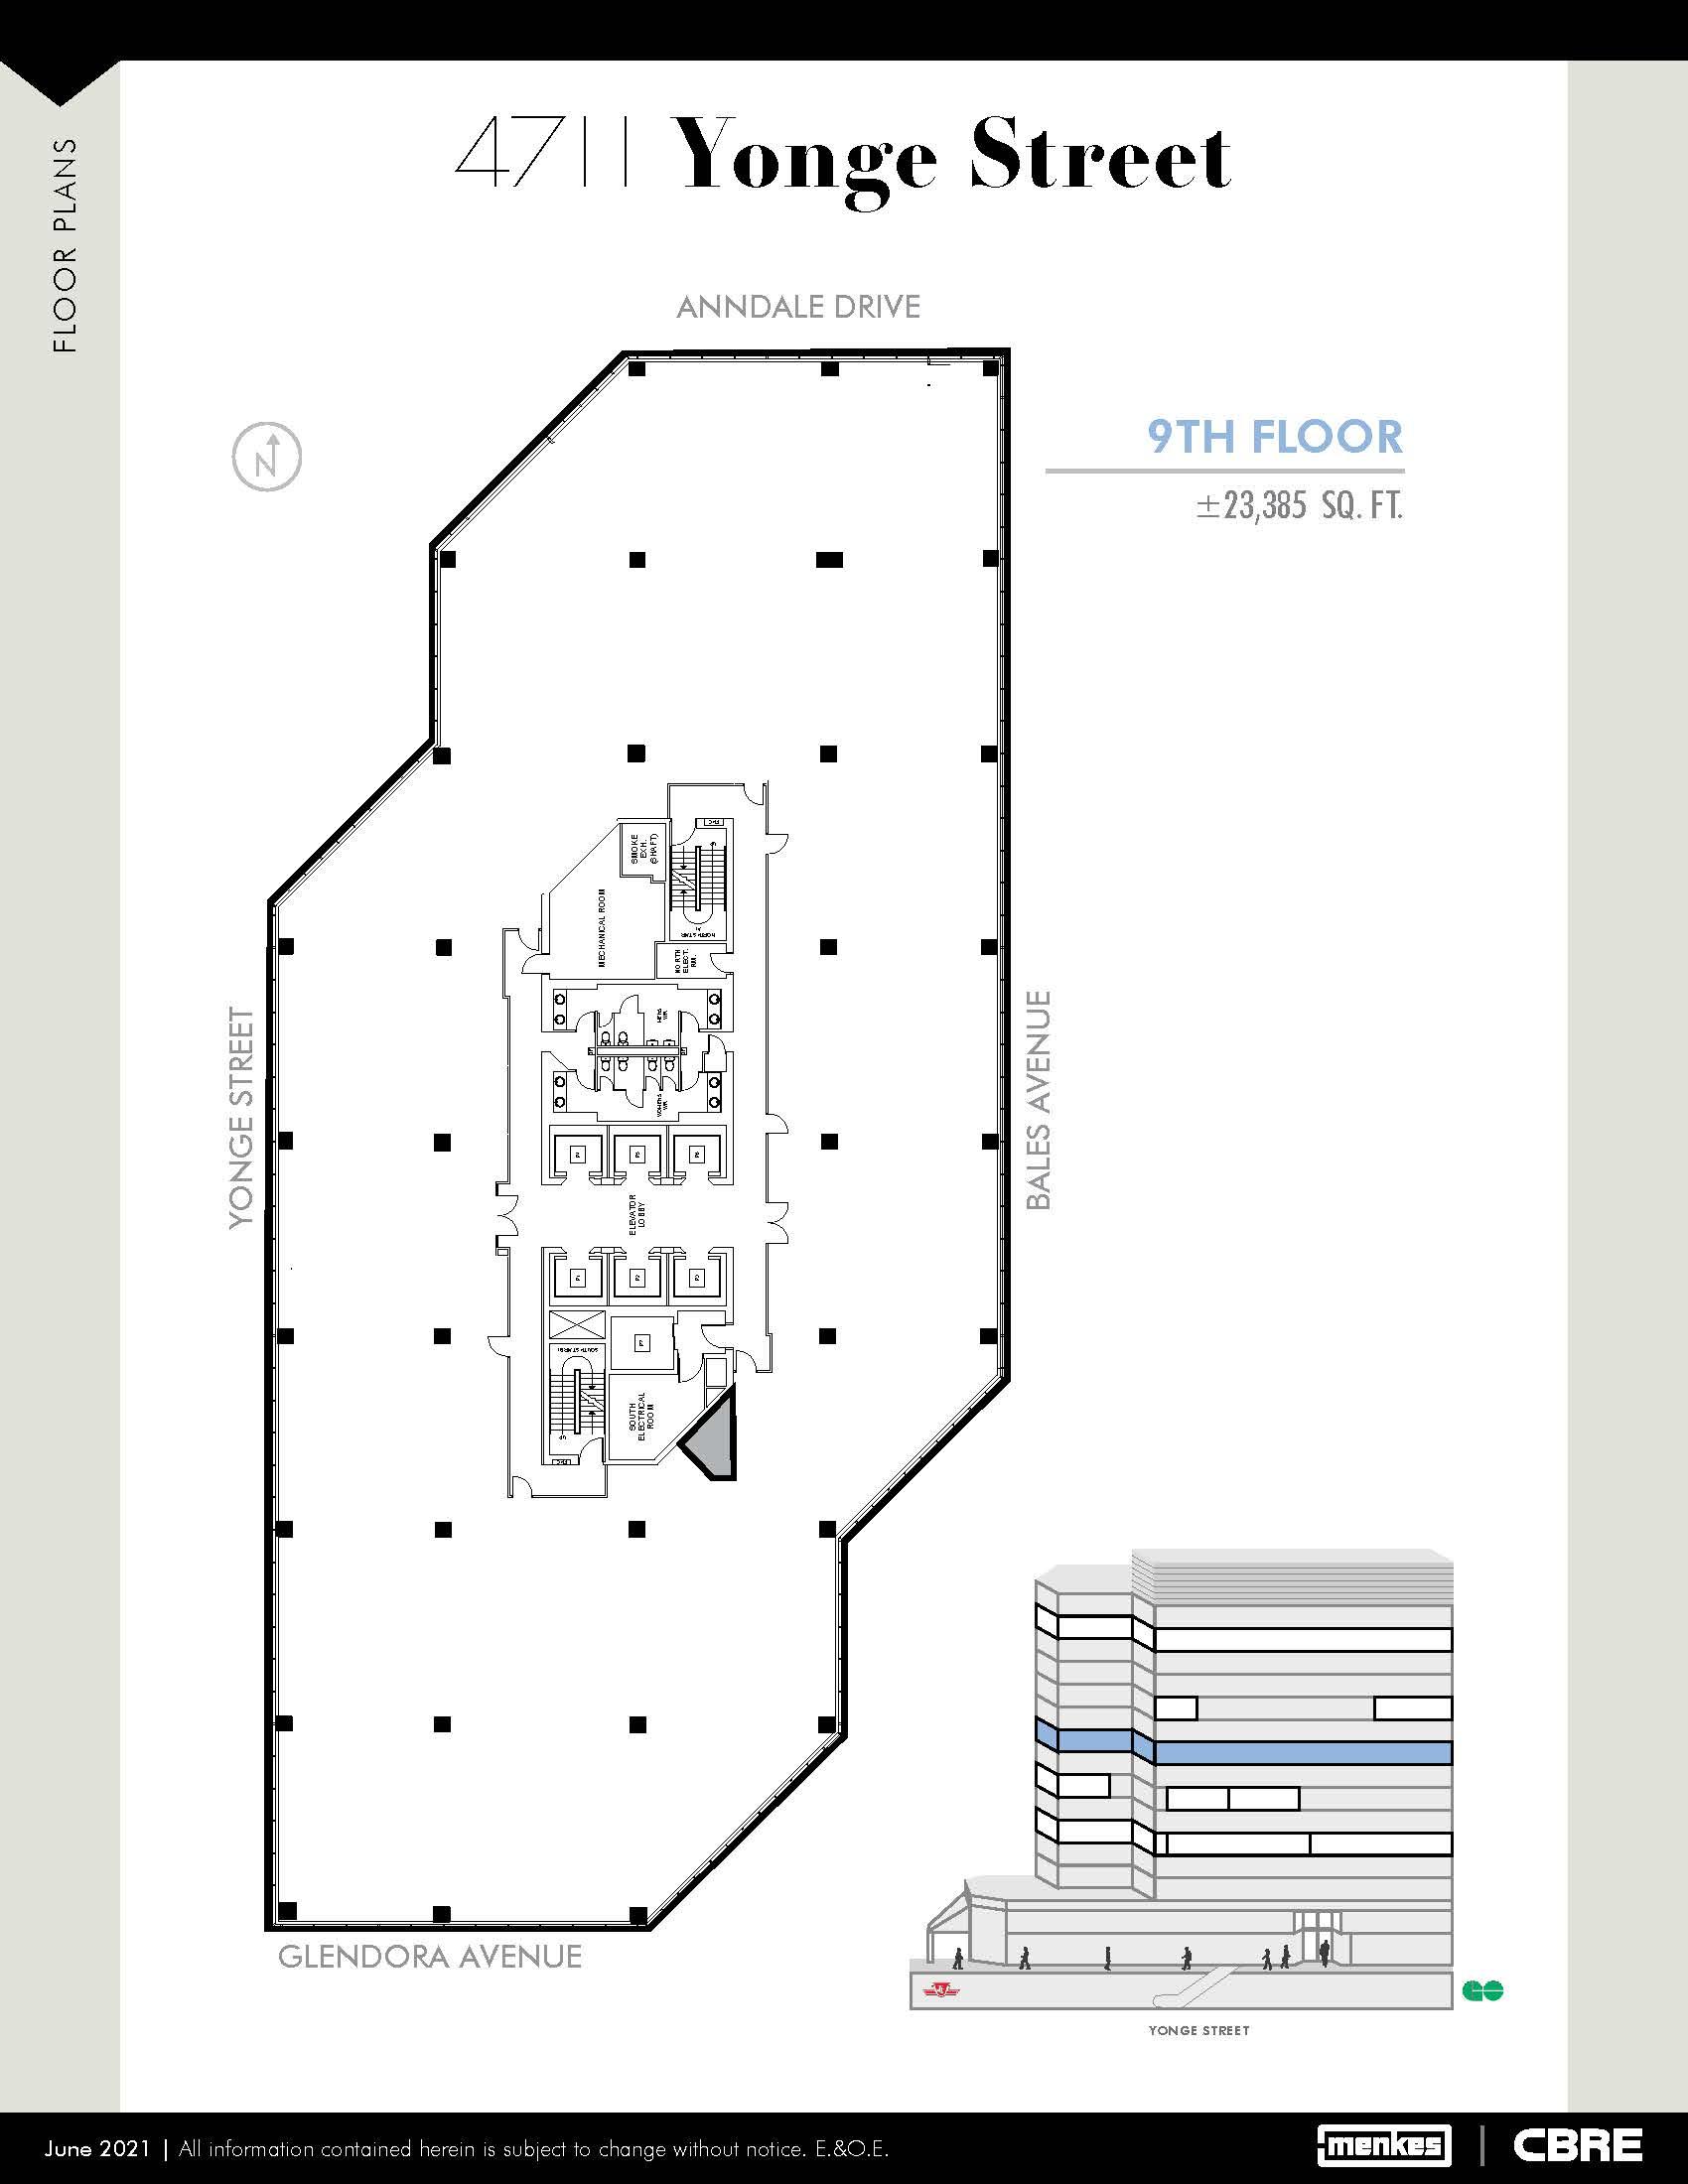 Floorplan thumbnail of Suite 900